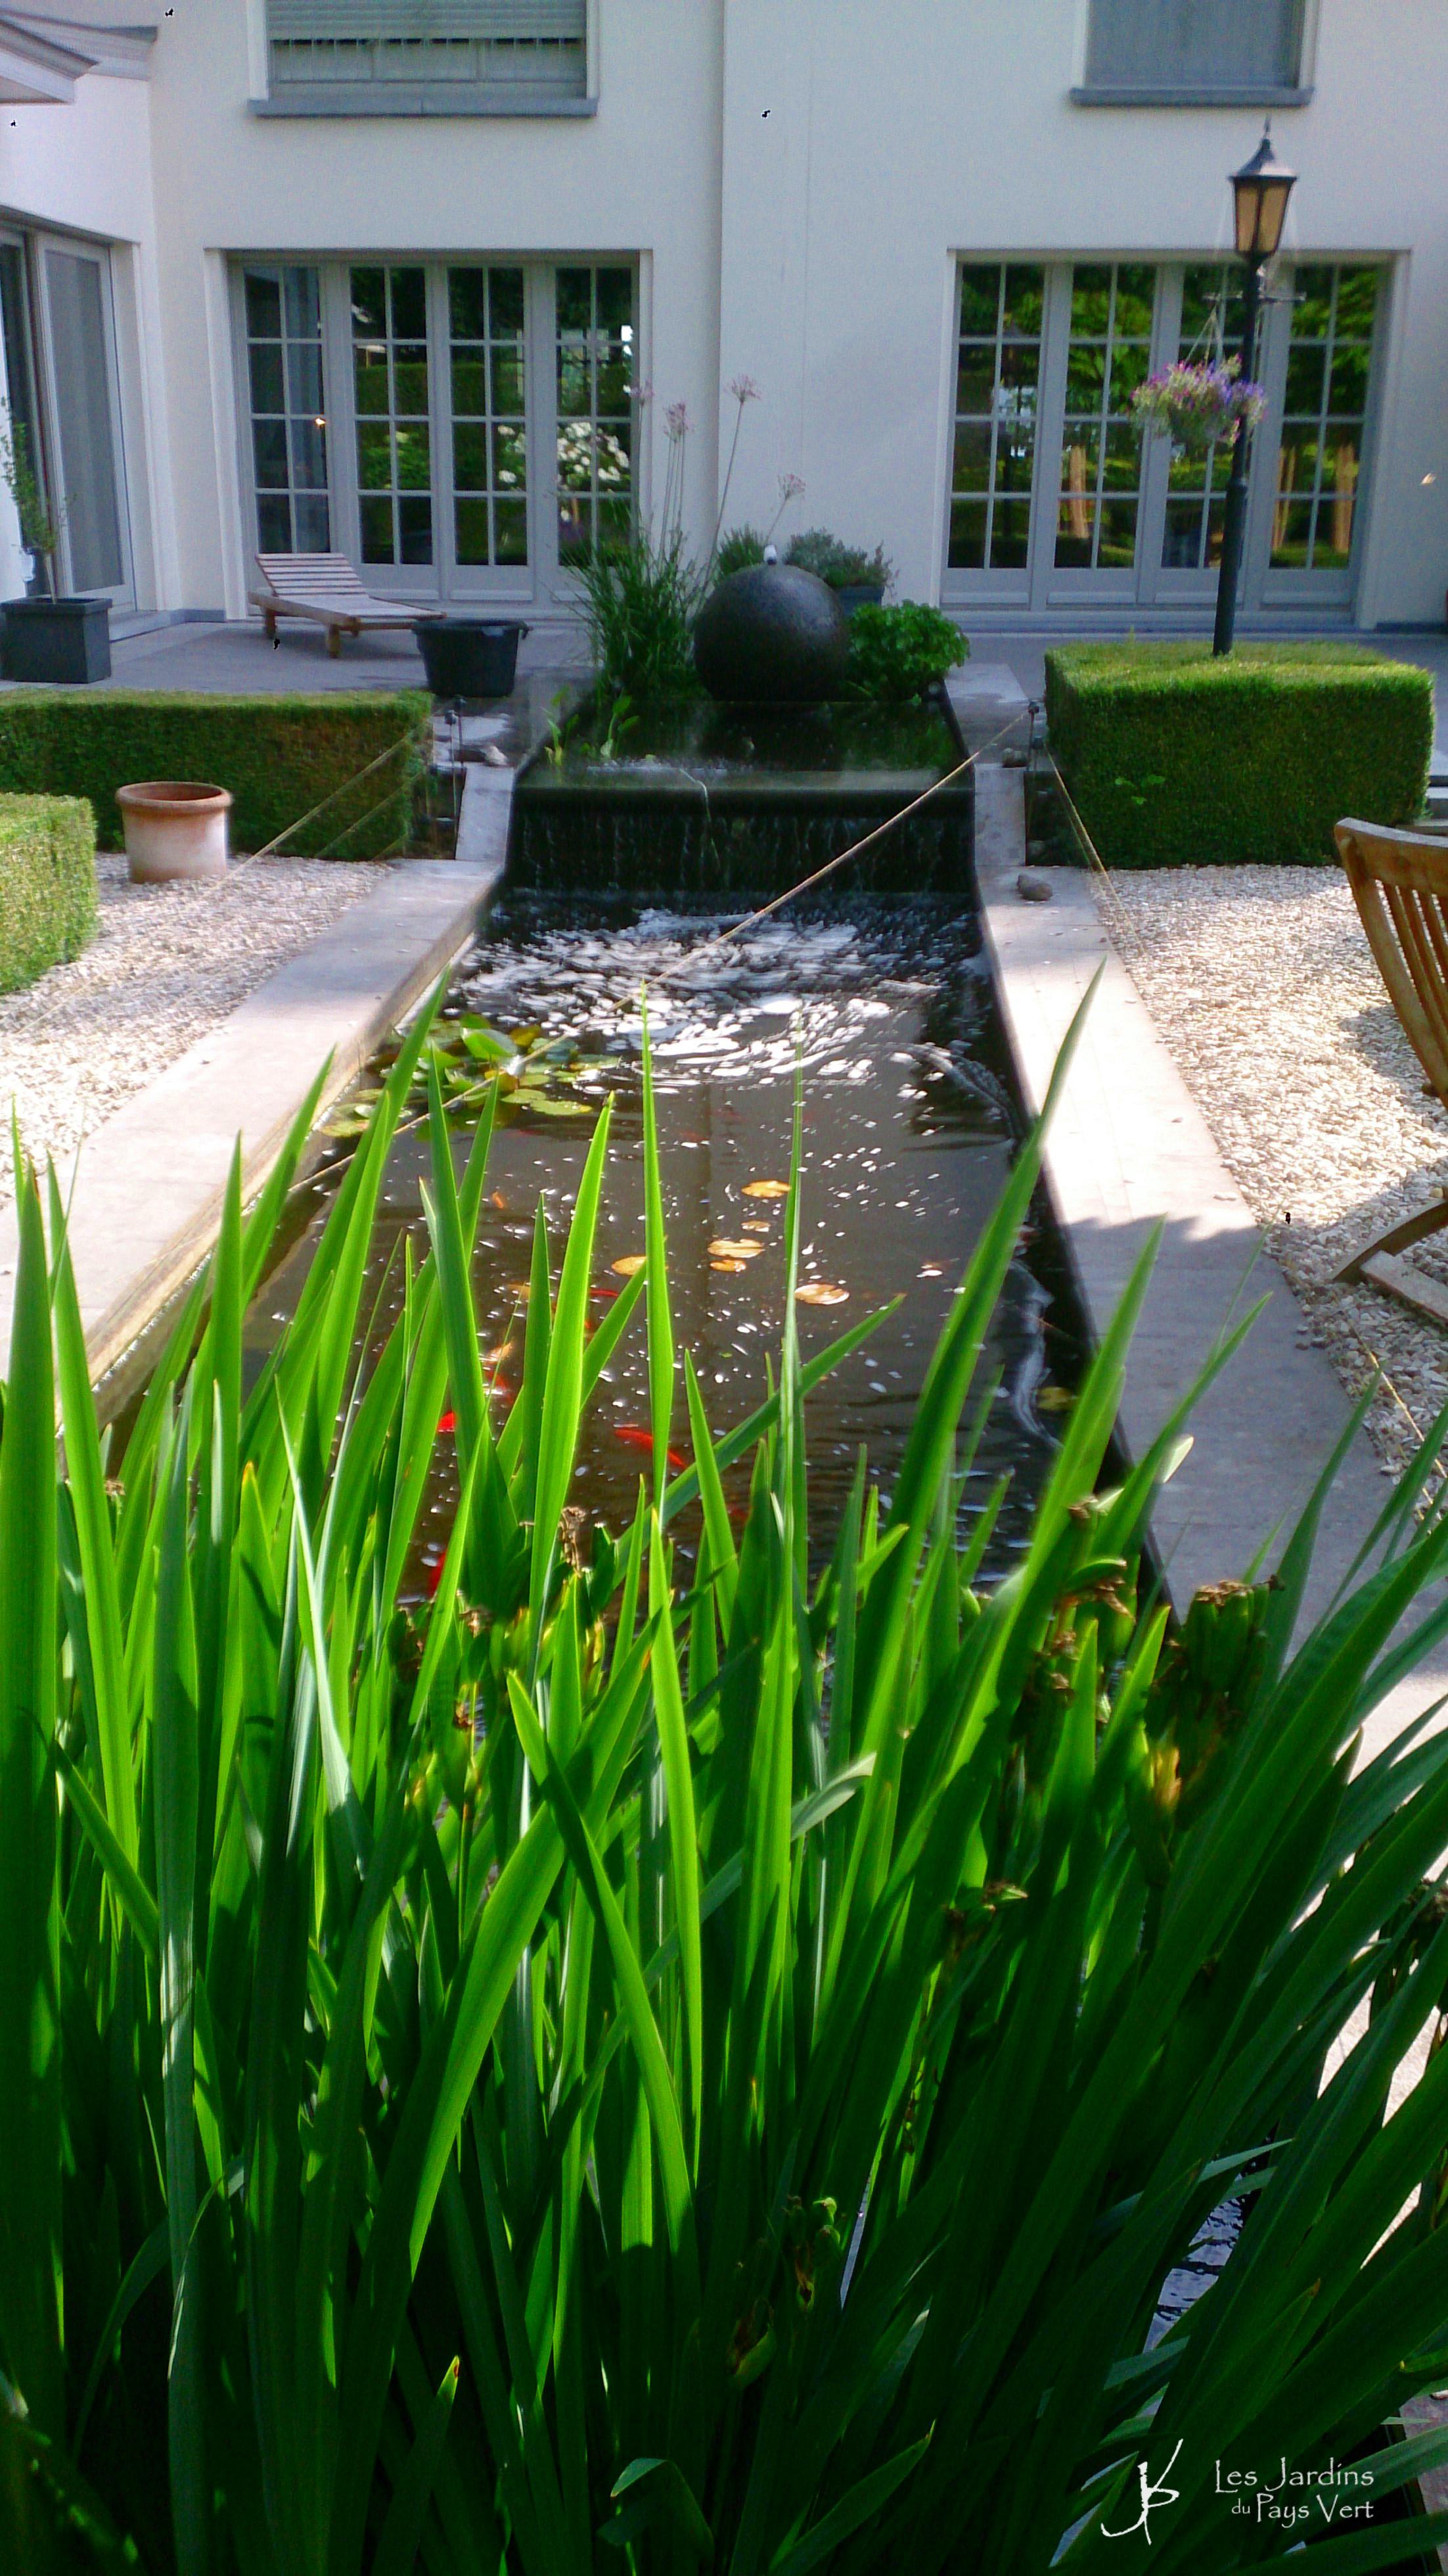 Entretiens de jardins jardins du pays vert for Jardin du pic vert